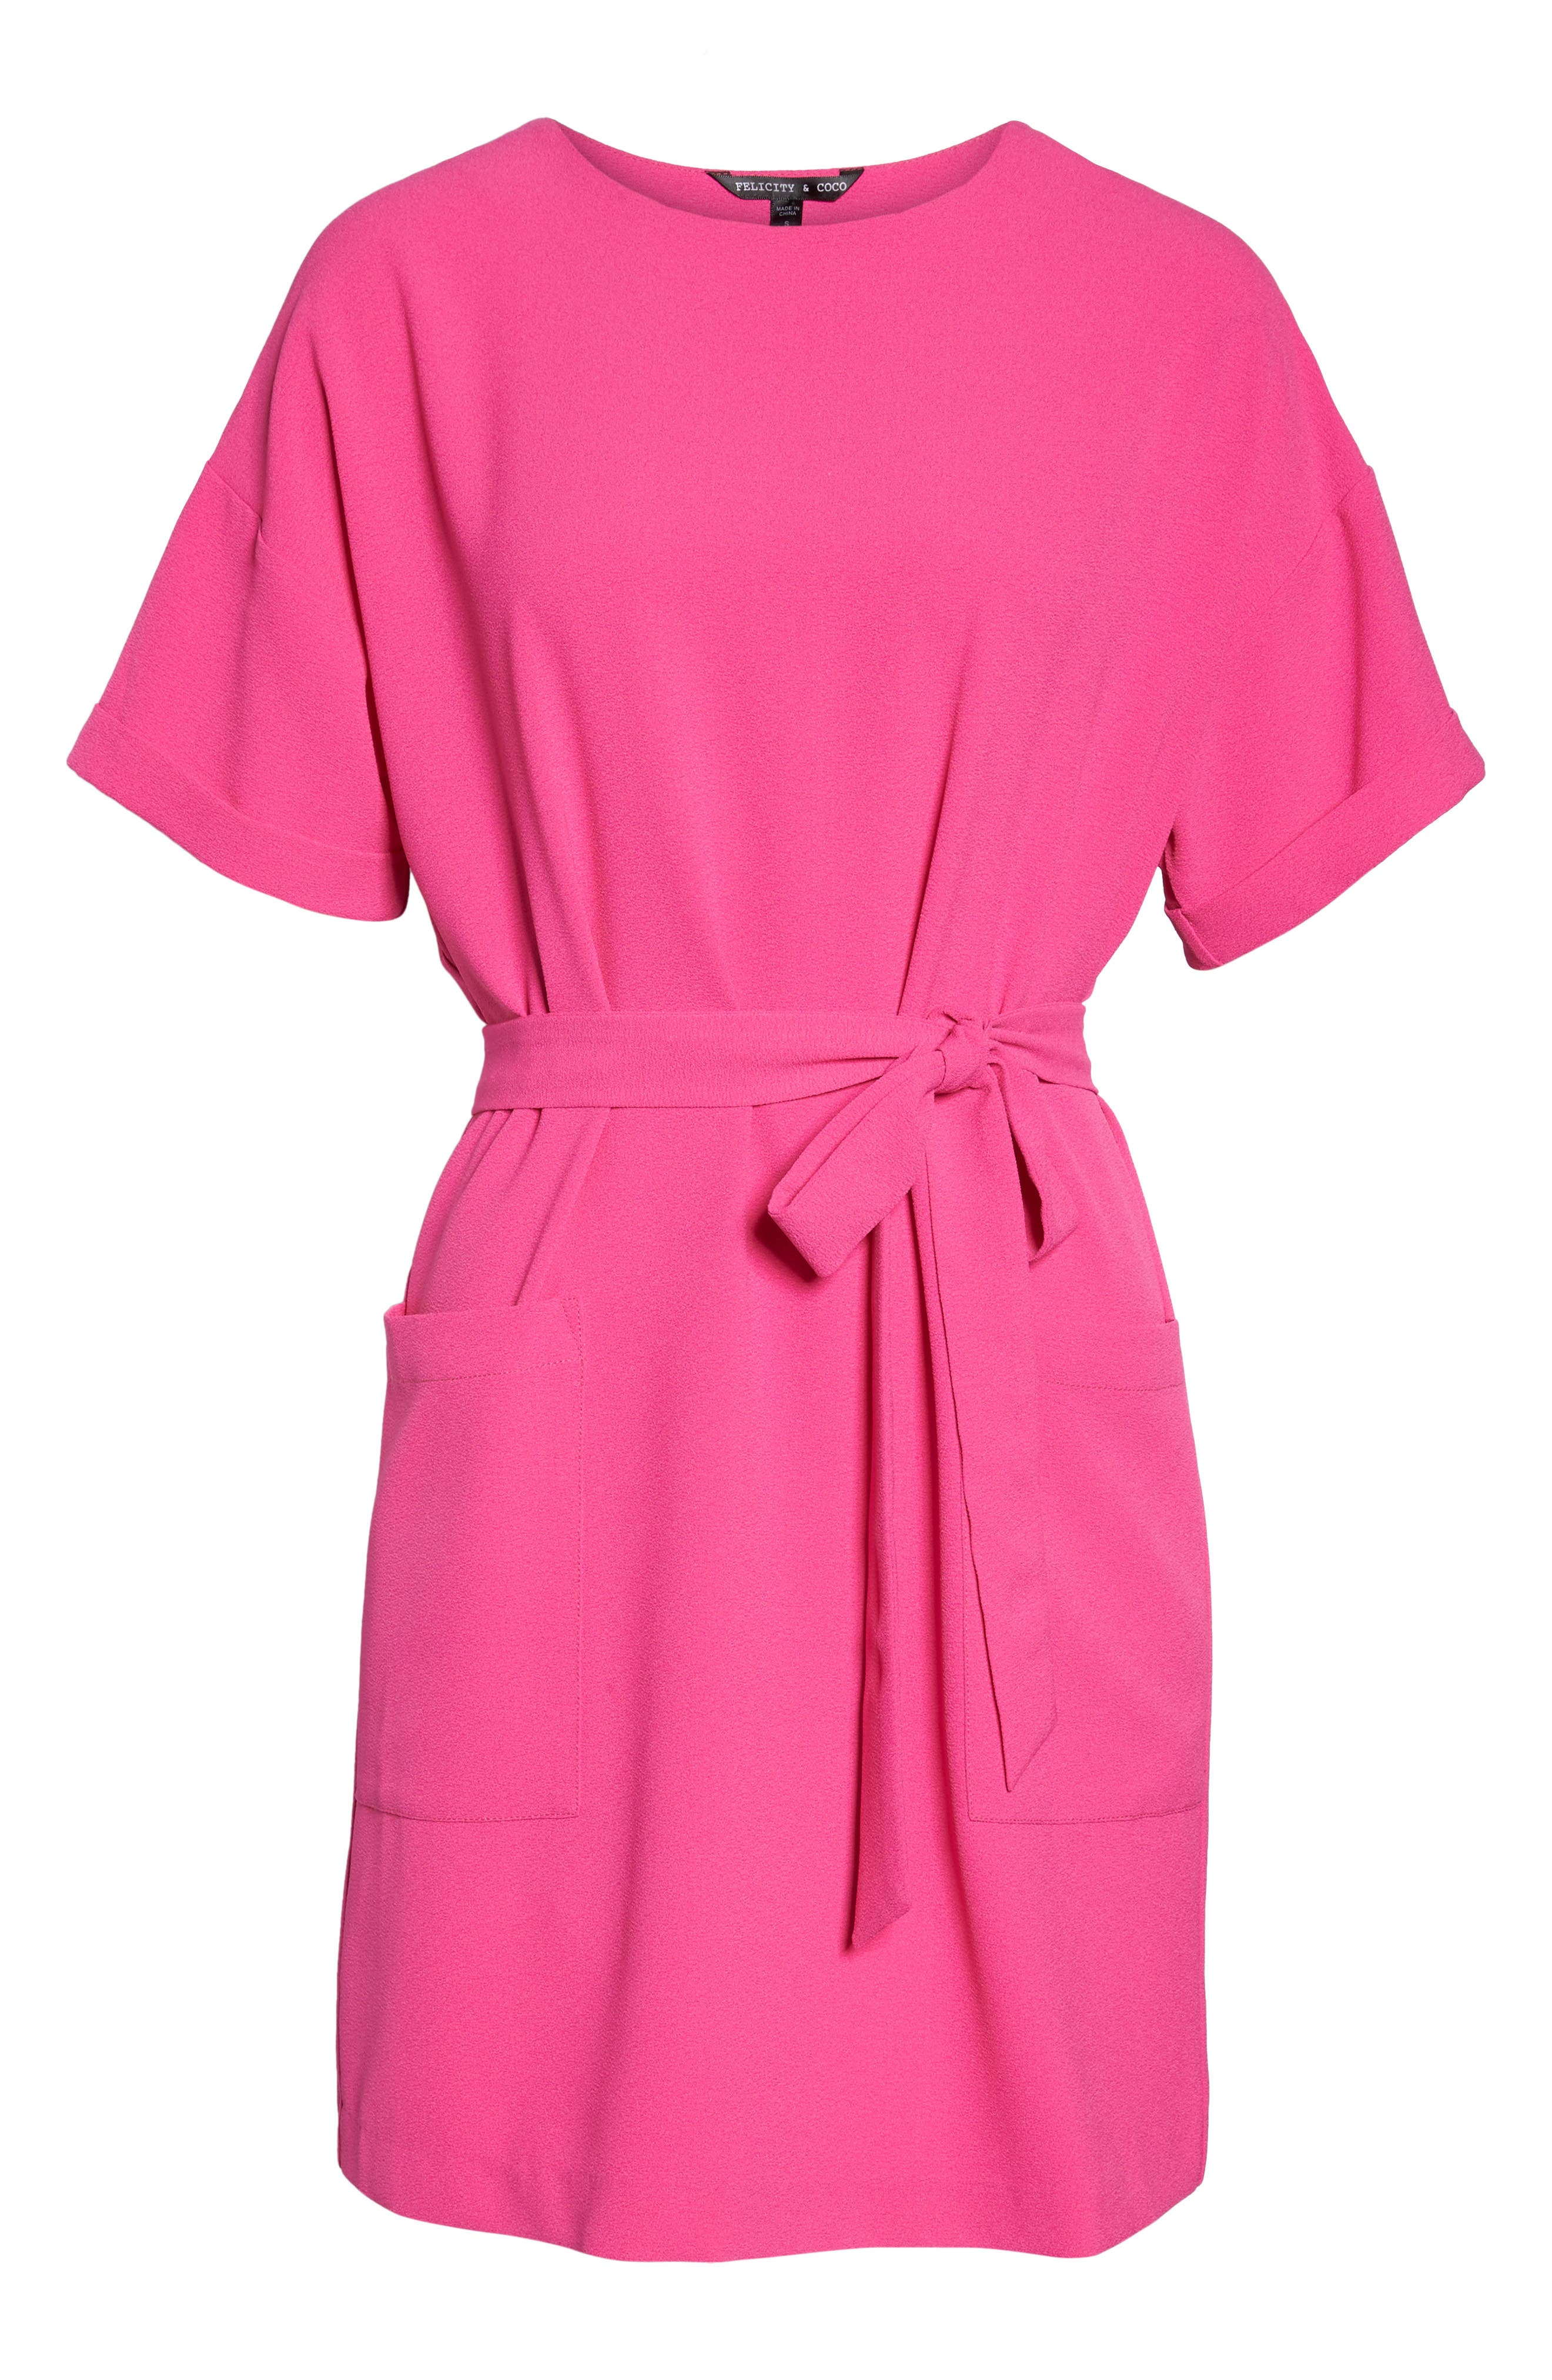 Halia Tie Waist Dress,                             Alternate thumbnail 6, color,                             Pink